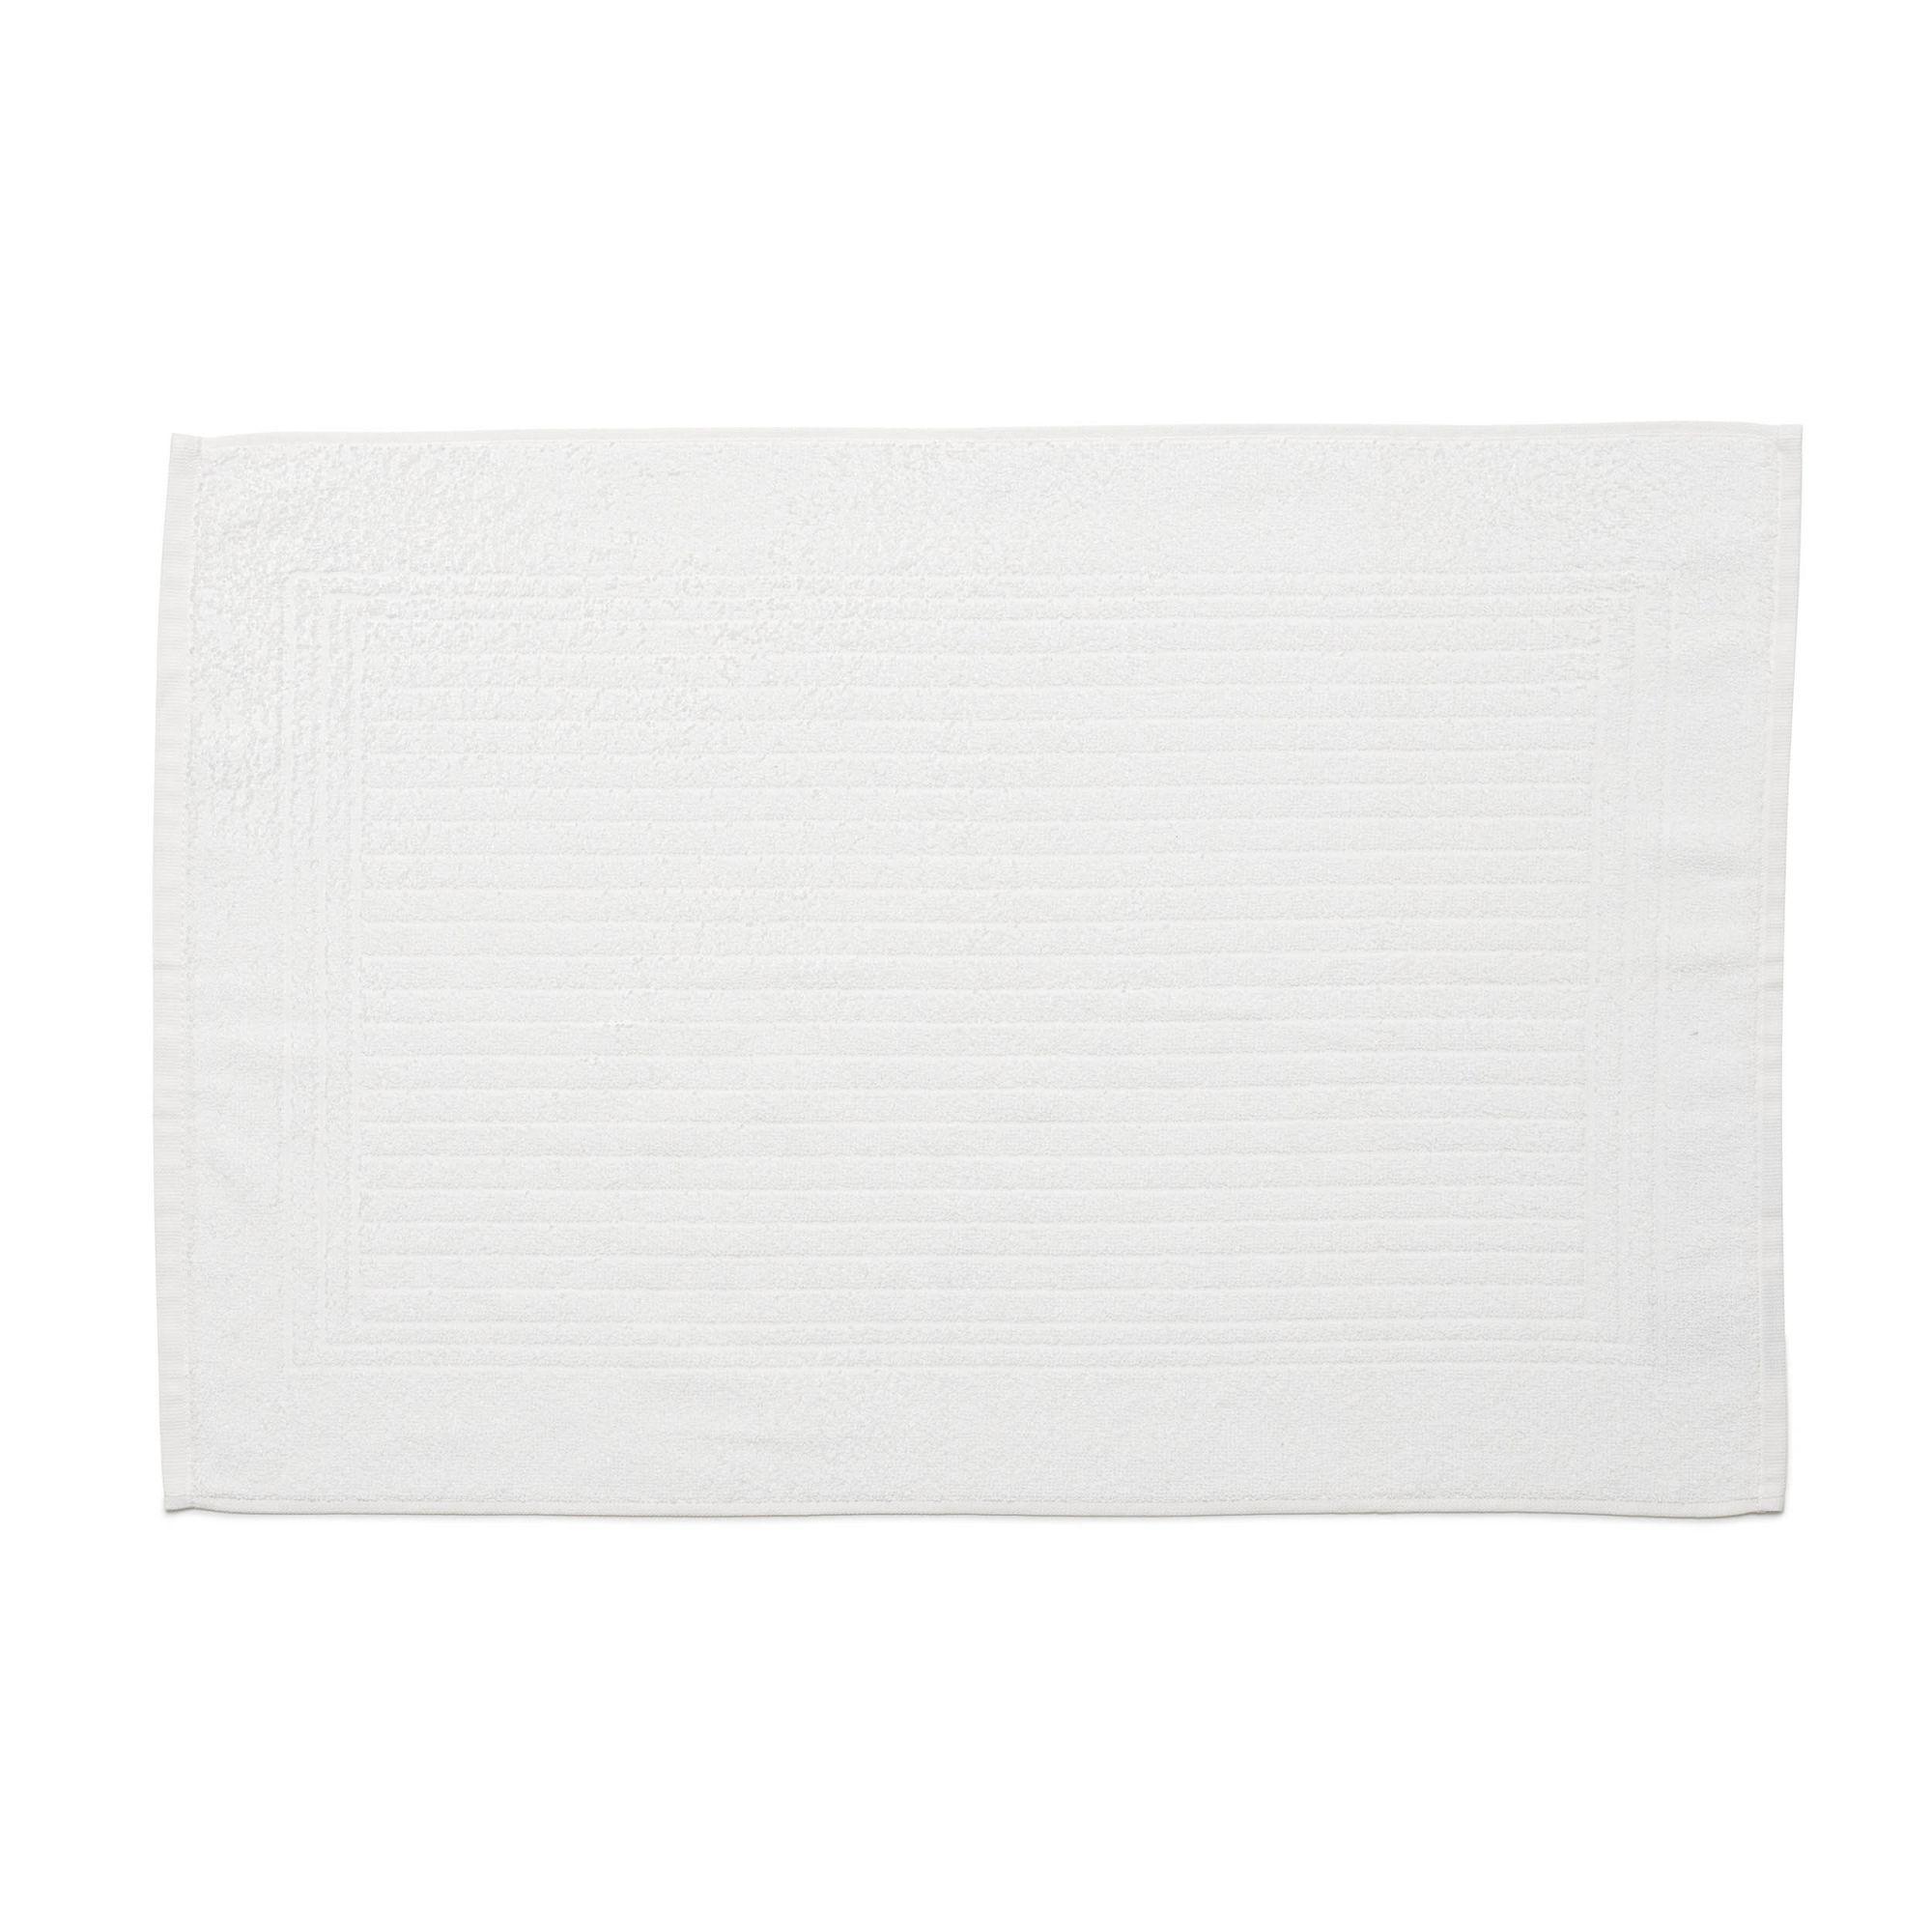 Piso cedro santista branco 100% algodao